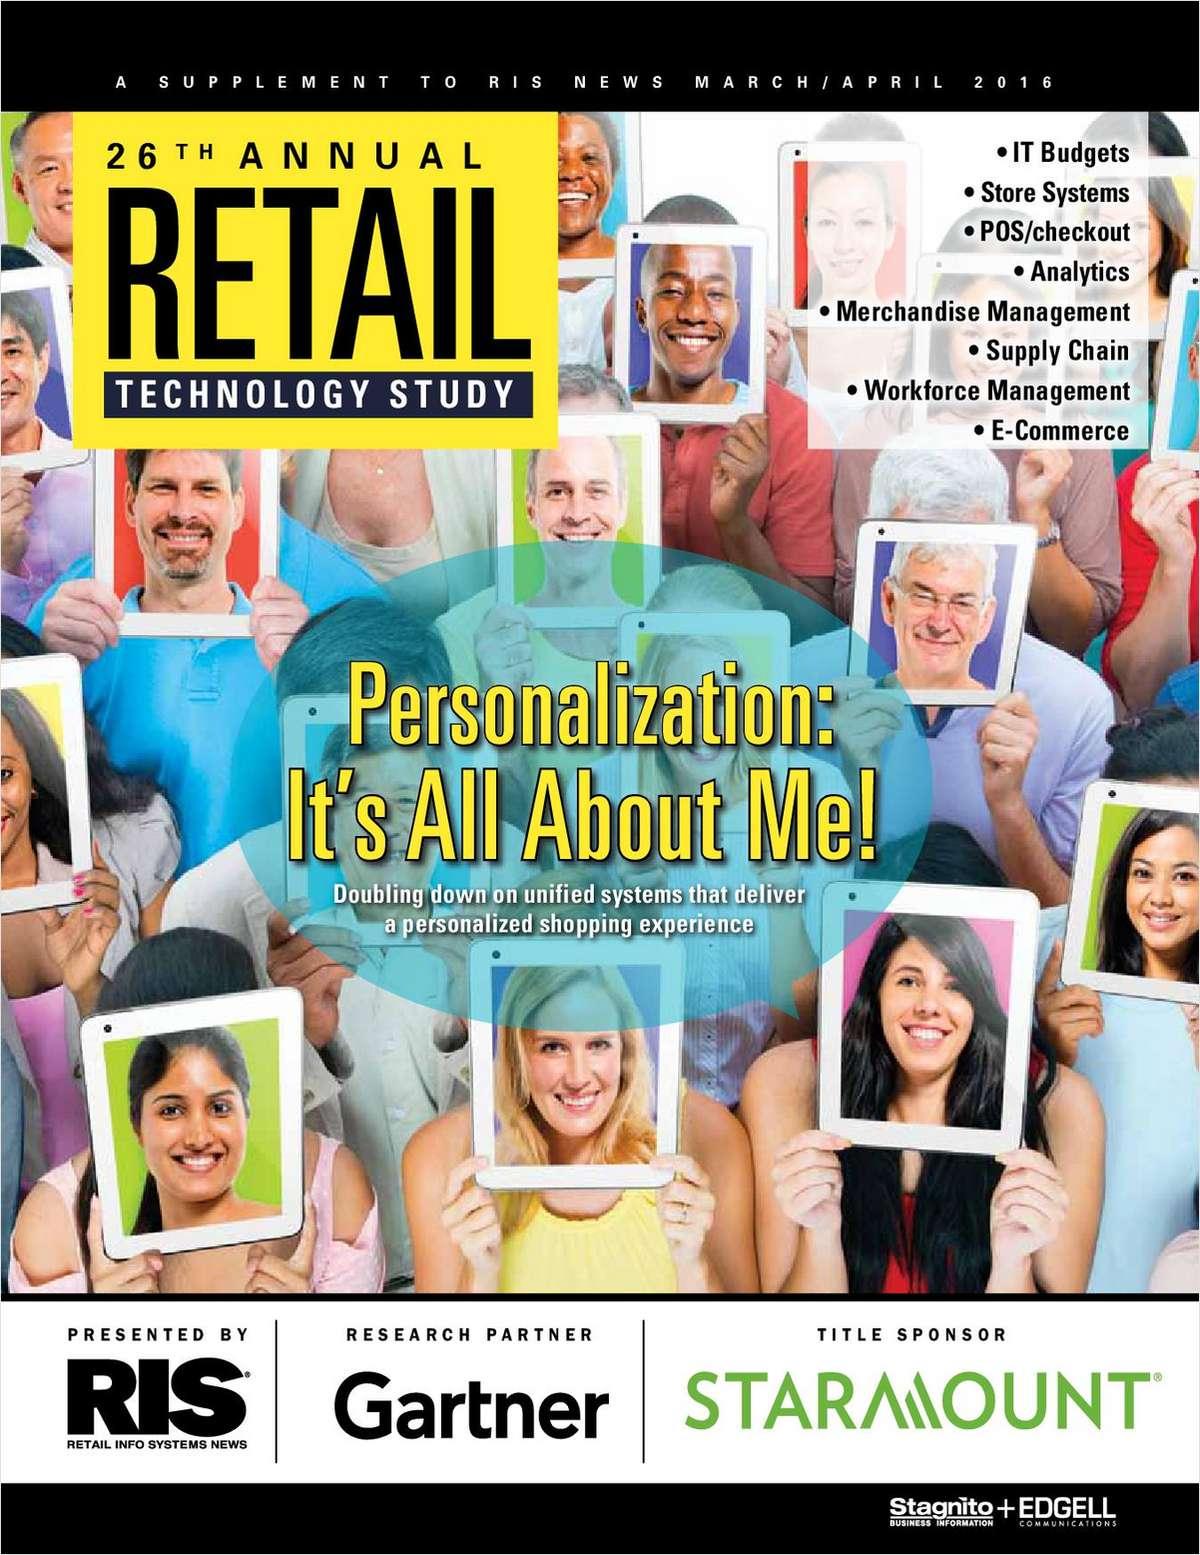 25th Annual RIS/Gartner Retail Technology Study